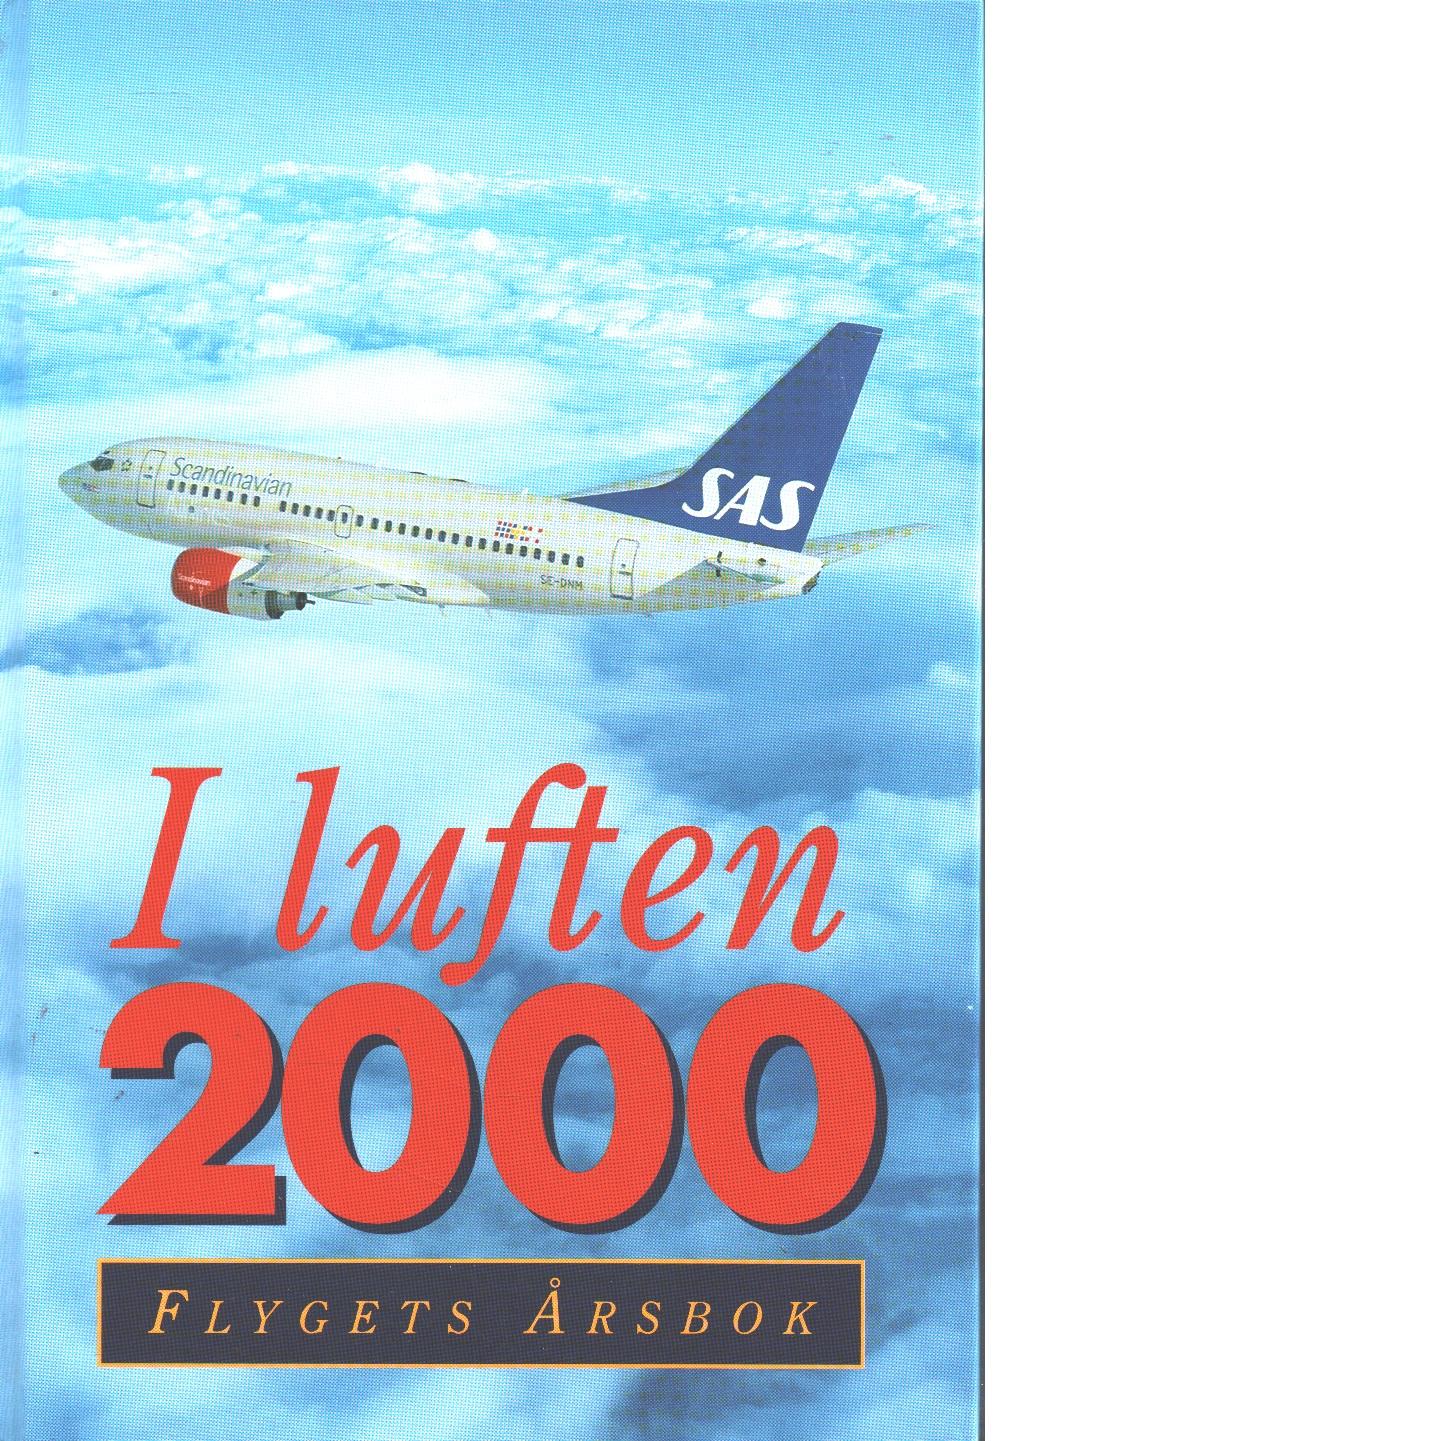 I LUFTEN FLYGETS ÅRSBOK 2000 - KRISTOFFERSSON, PEJ